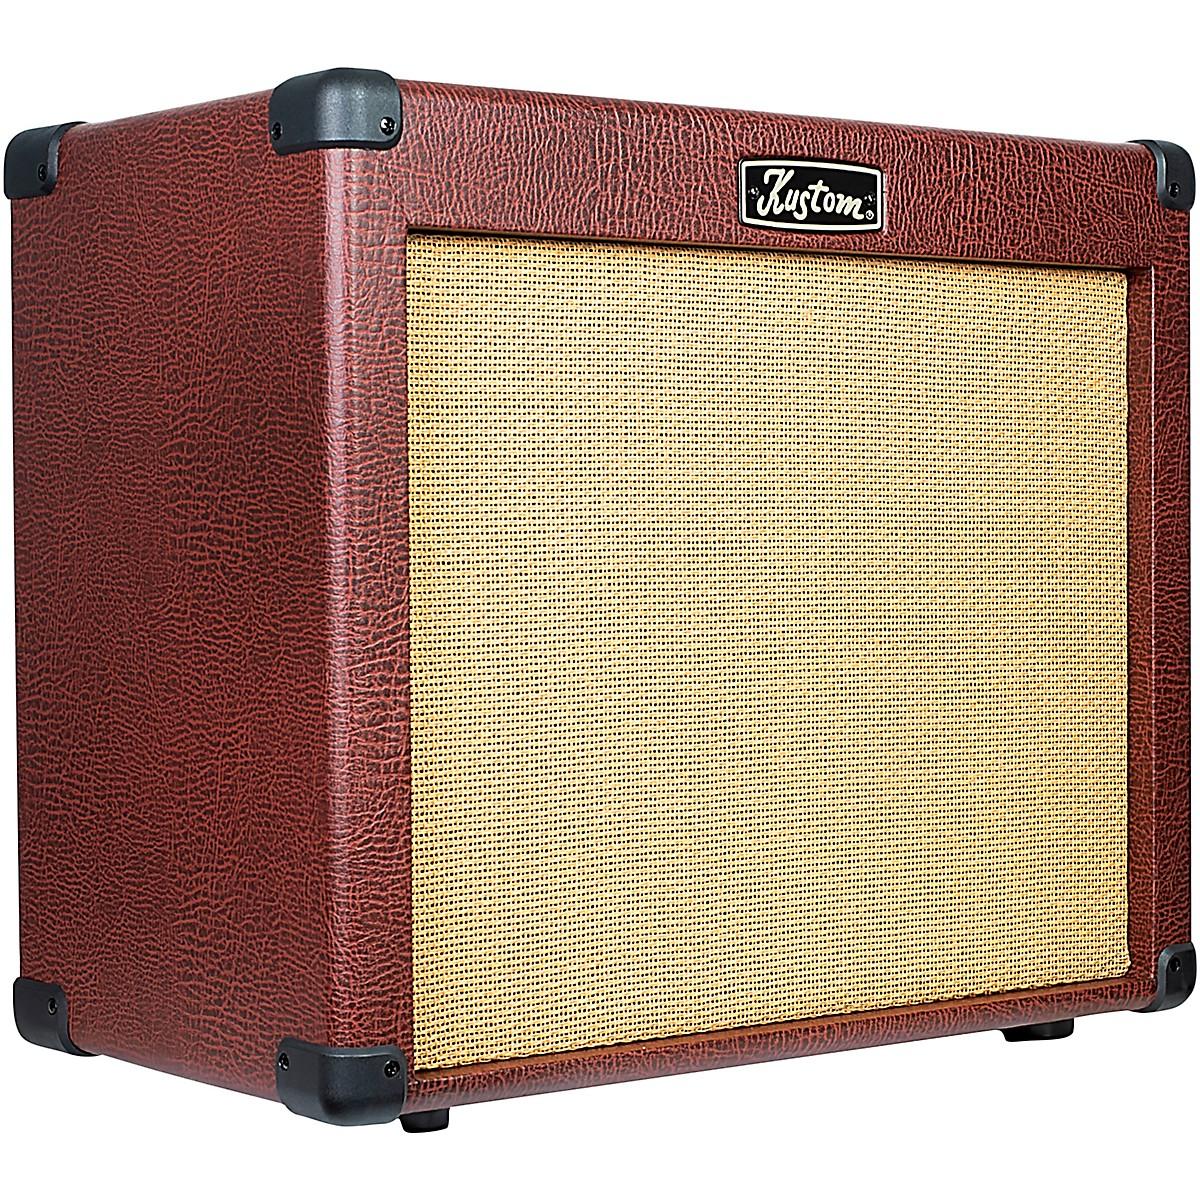 Kustom Sienna 65 Pro 65W 1x12 Acoustic Guitar Combo Amp